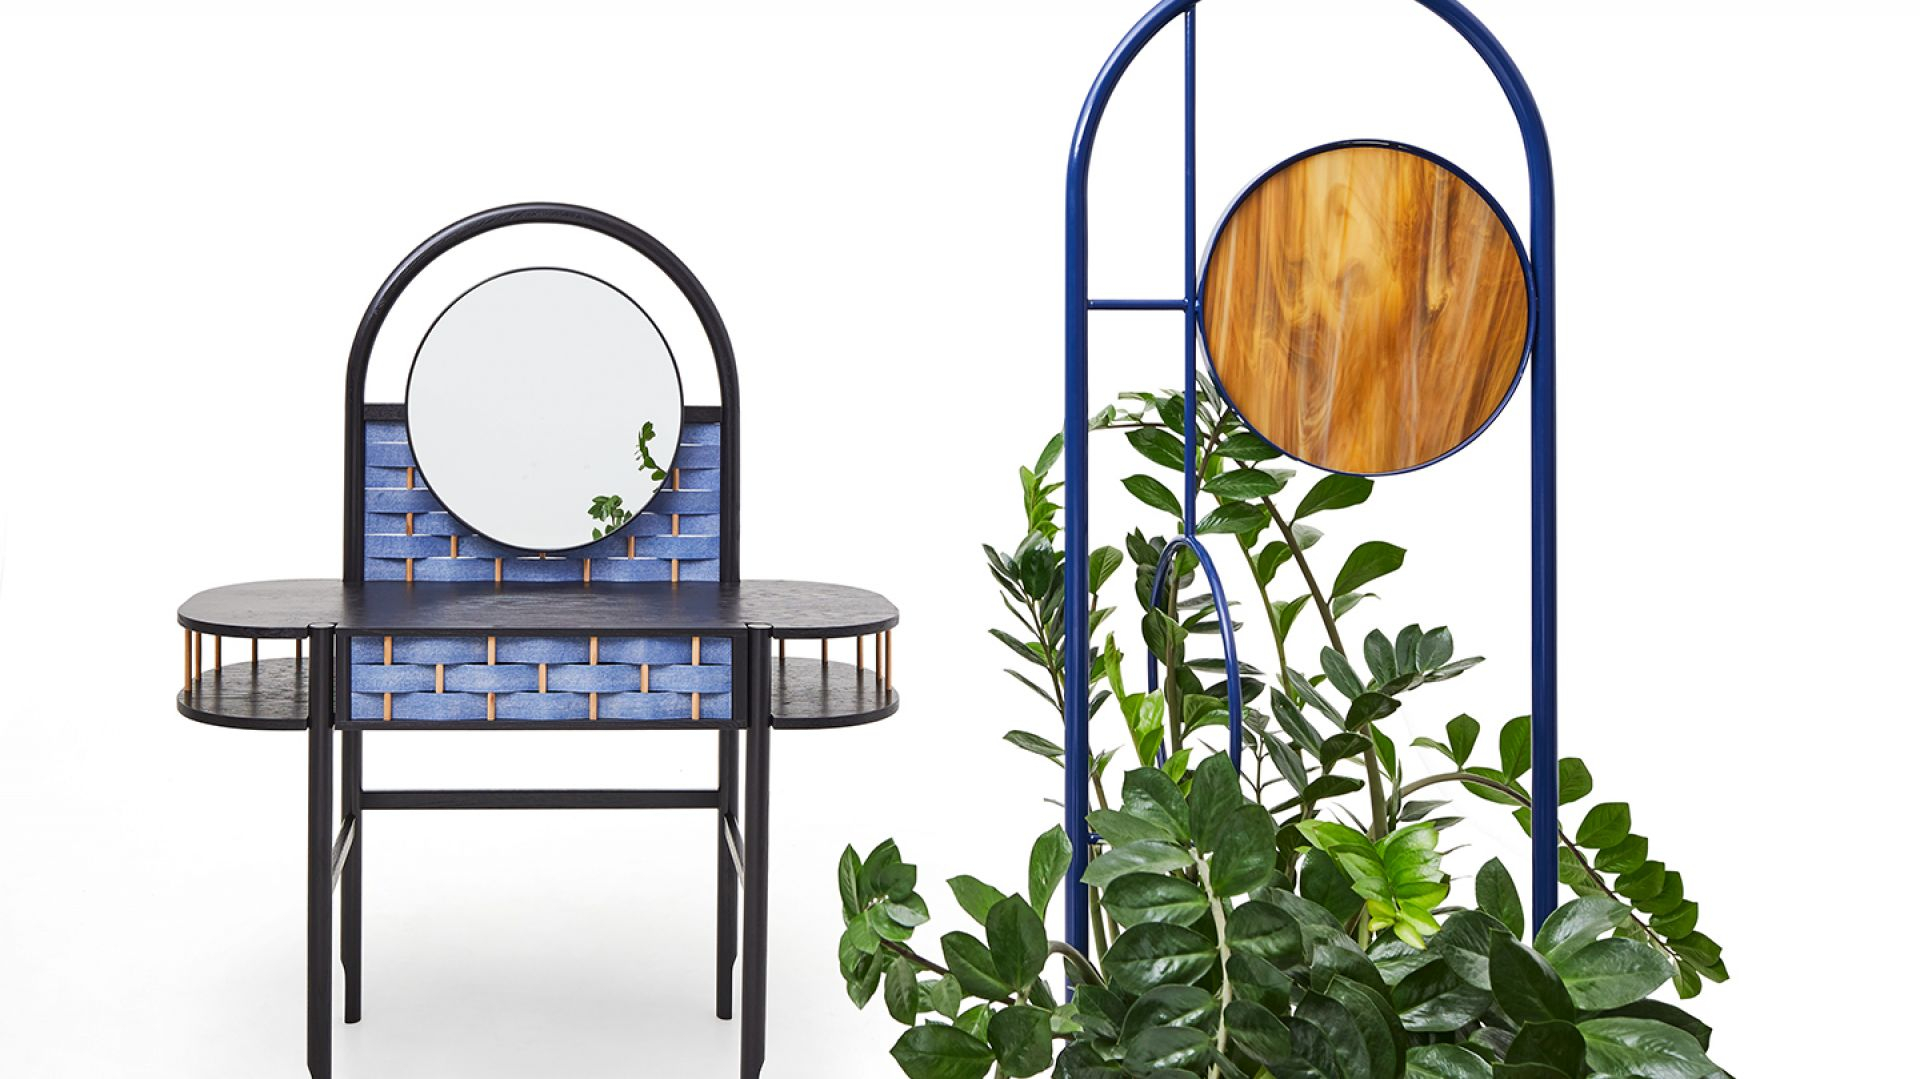 Splot by Sikorski Supreme Furniture. Projekt: Zofia Strumiłło-Sukiennik. Fot. Marek Swoboda